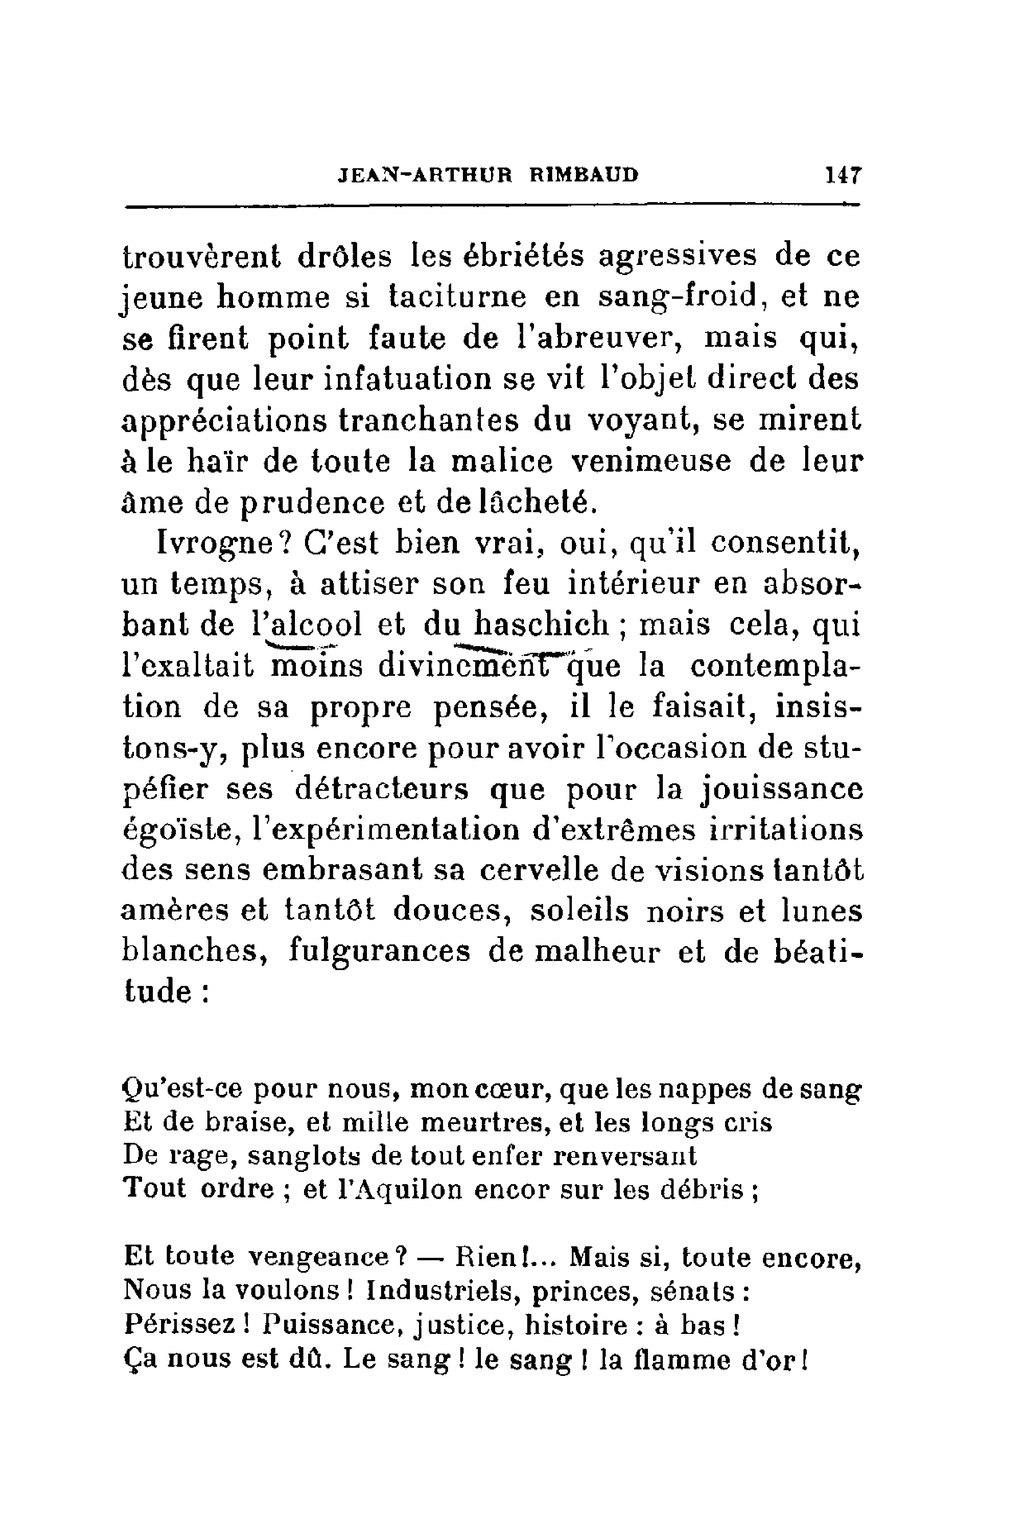 Pageberrichon Jean Arthur Rimbaud 1912djvu146 Wikisource